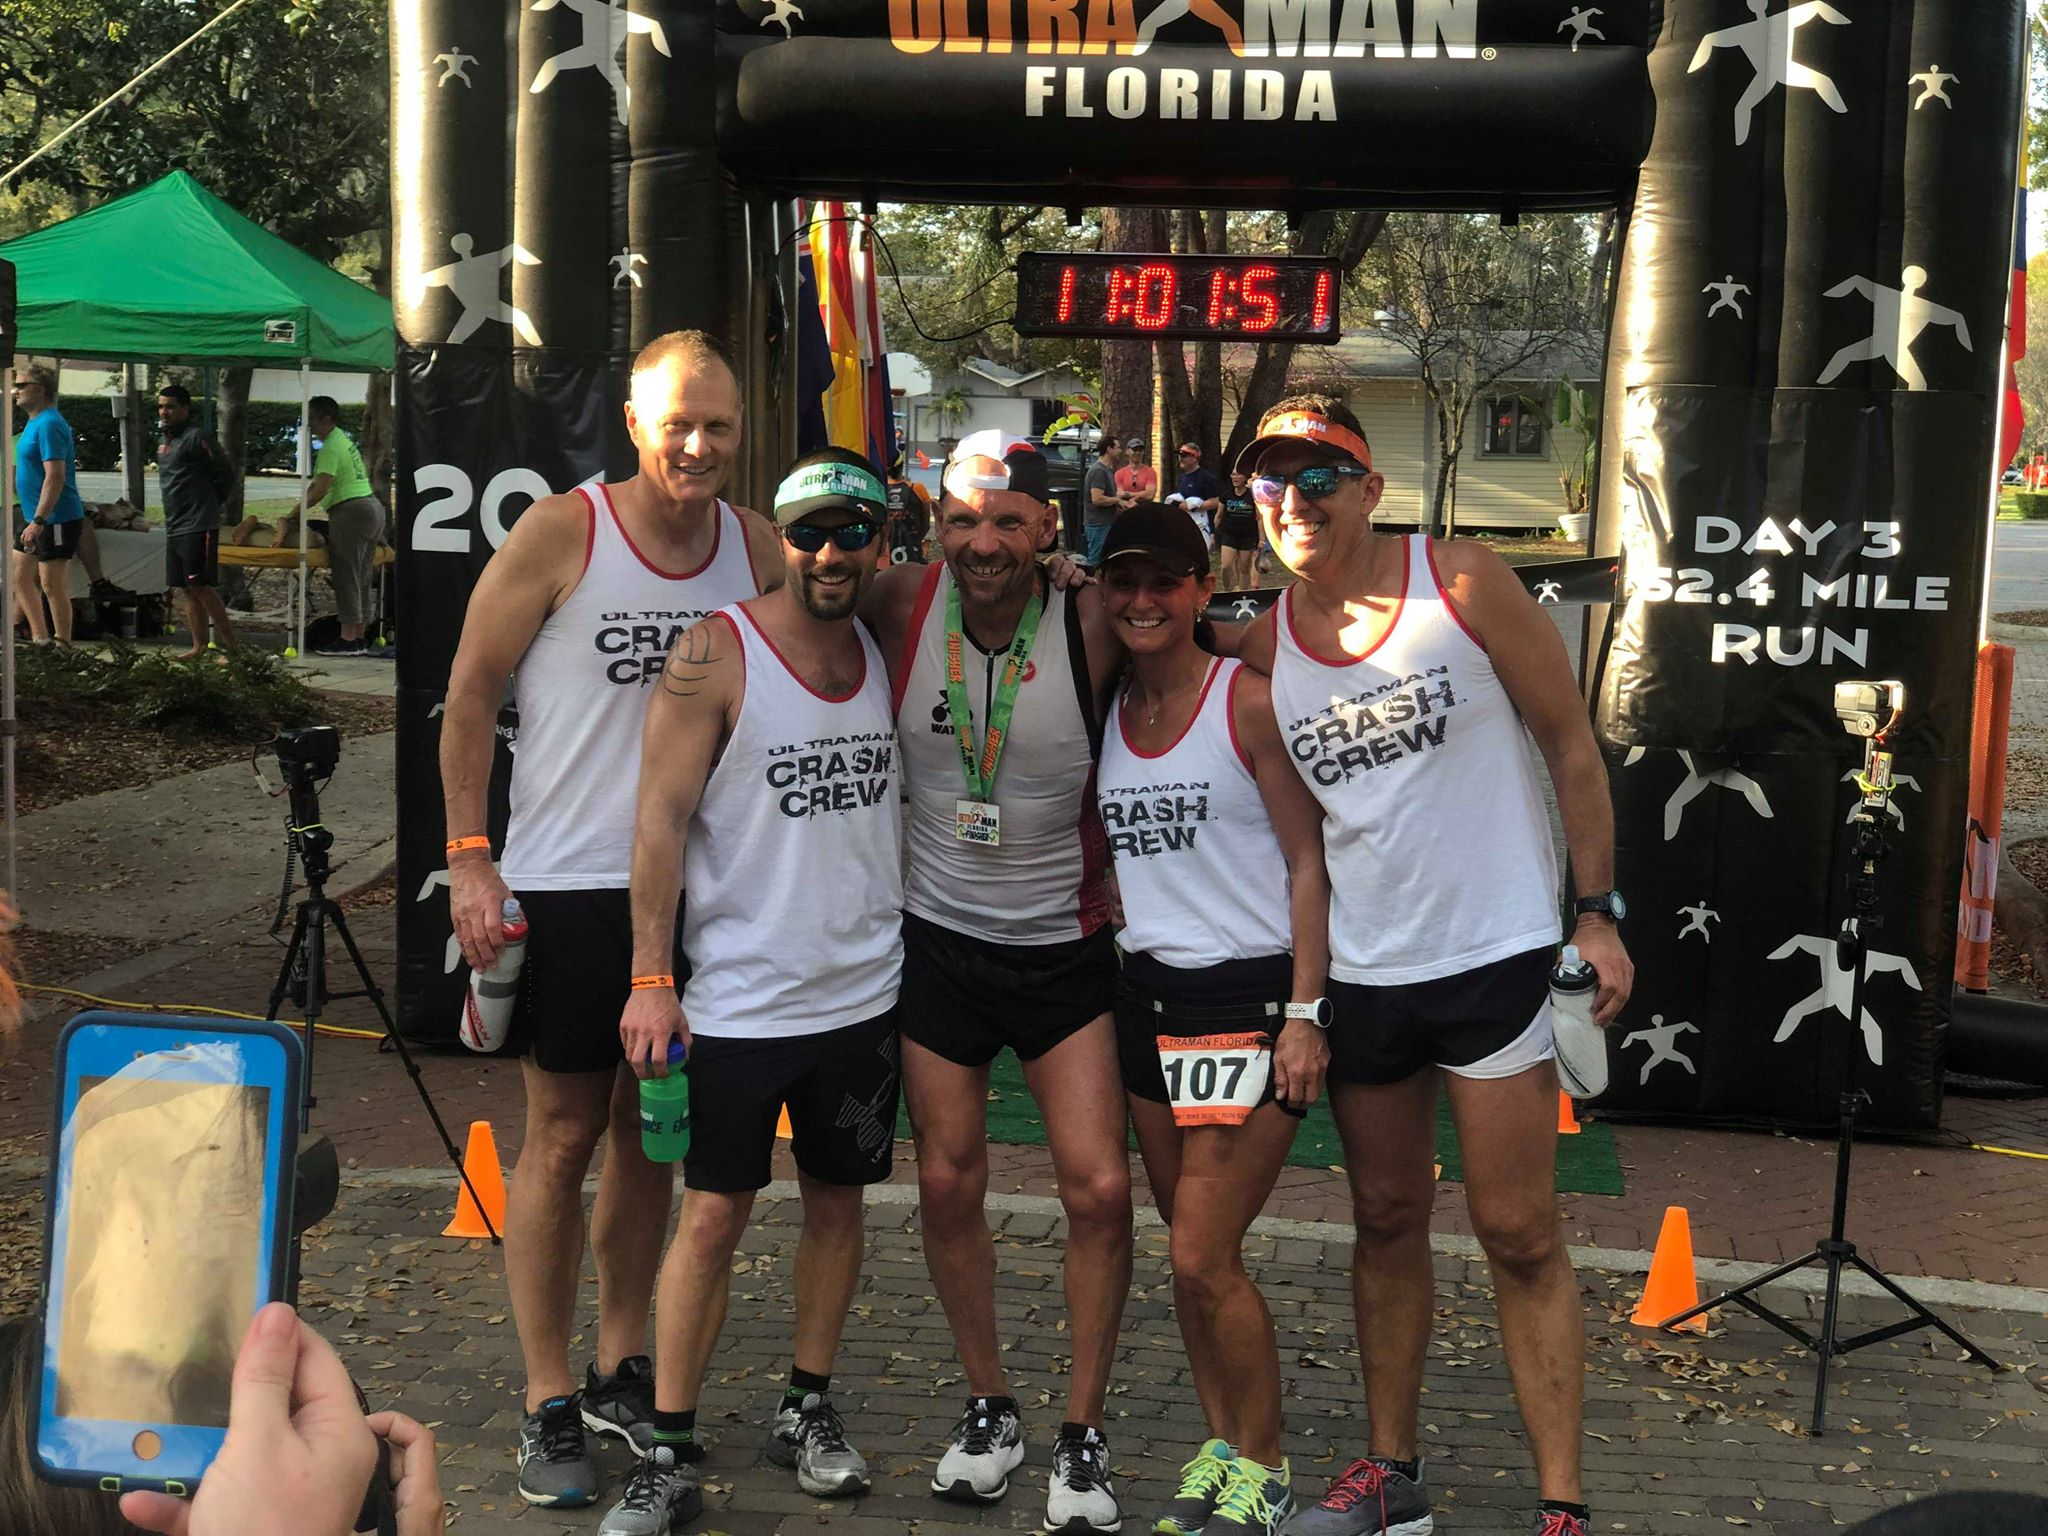 Coach_Terry_Wilson_Pursuit_of_The_Perfect_Race_Ultraman_Florida_Chris_Pollack_Finish.jpg